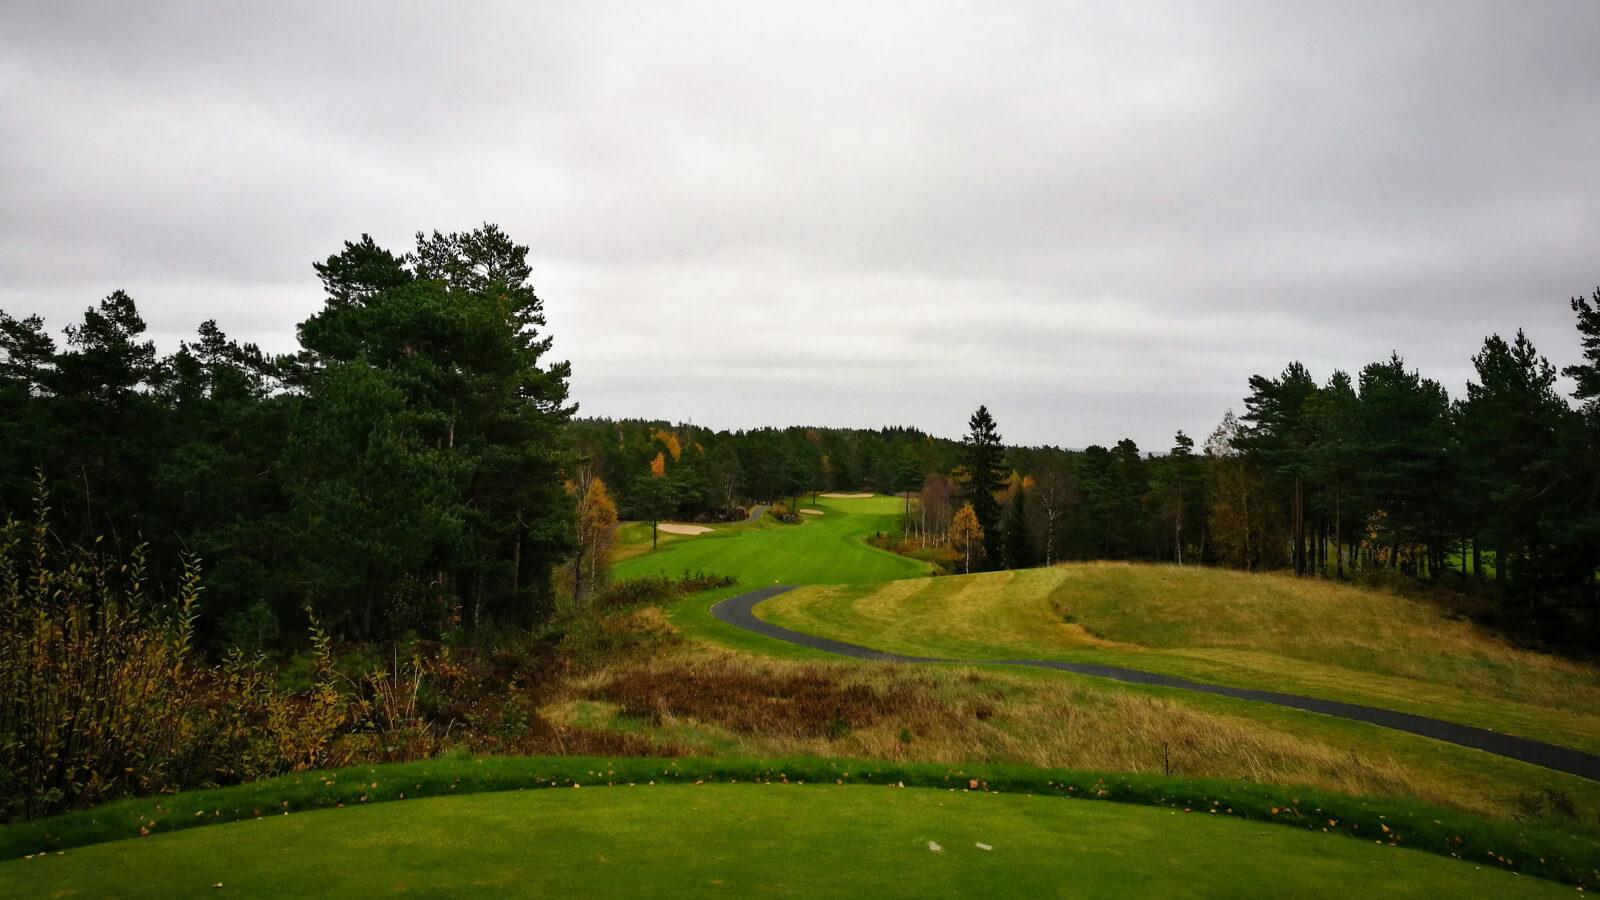 Hull 16, Kragerø Golfklubb